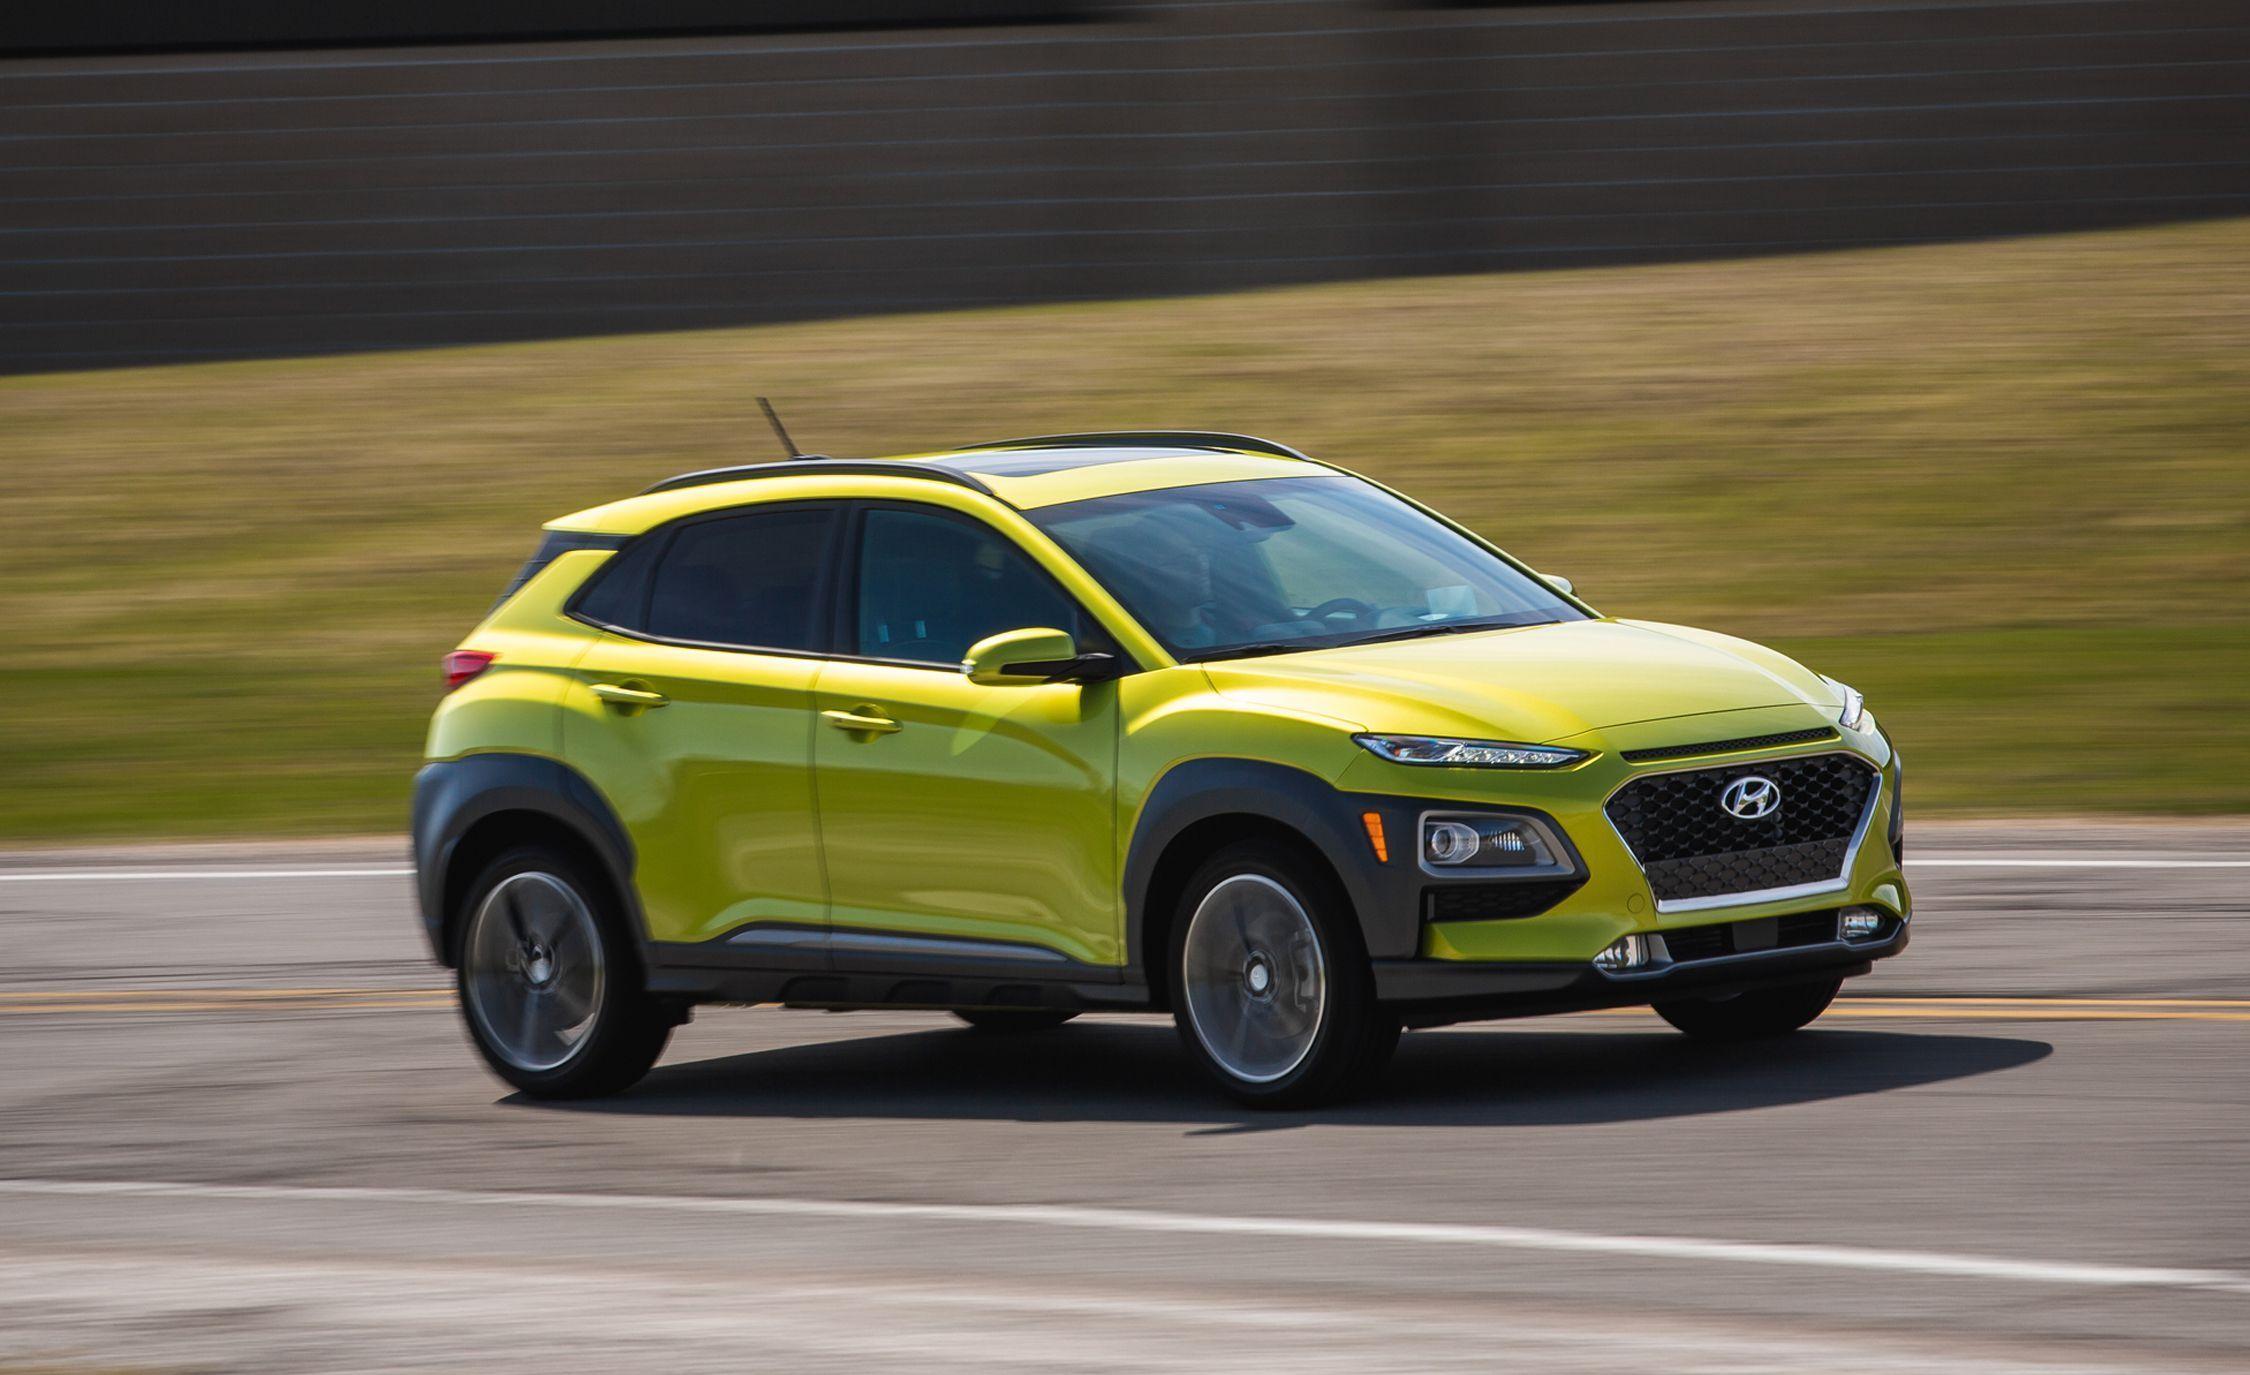 2019 Hyundai Kona Review Pricing And Specs